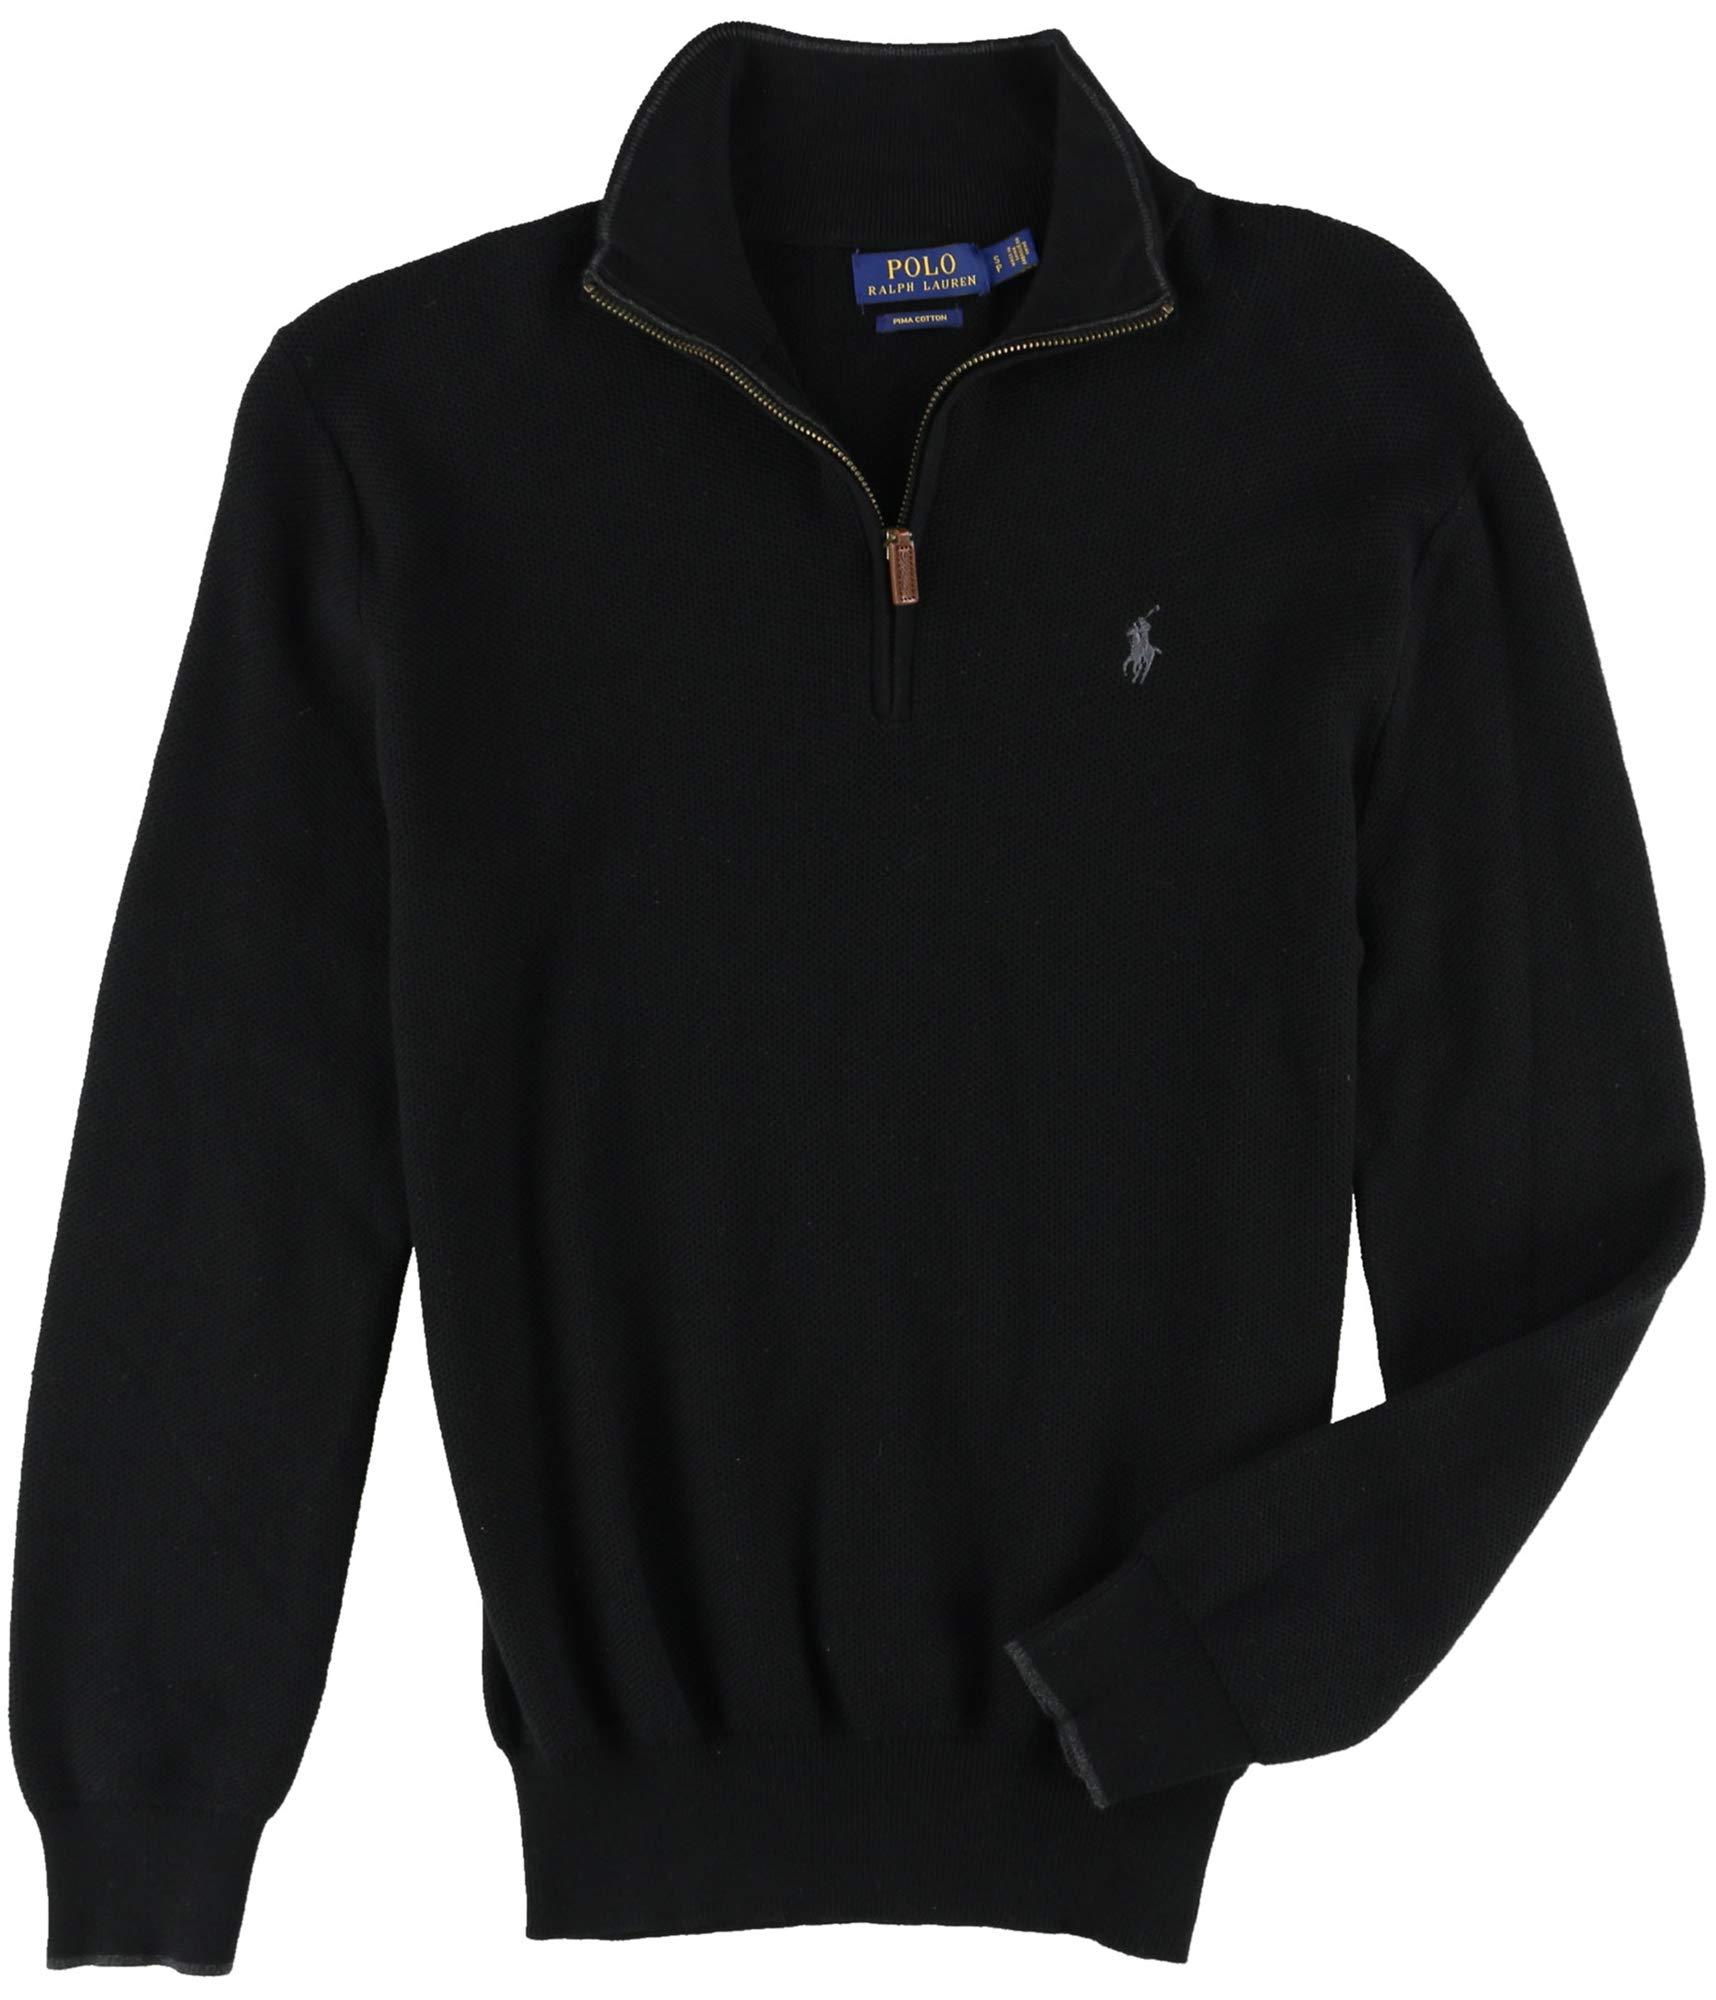 Polo Ralph Lauren Mens Ribbed Trim Zipper Henley Sweater Black S